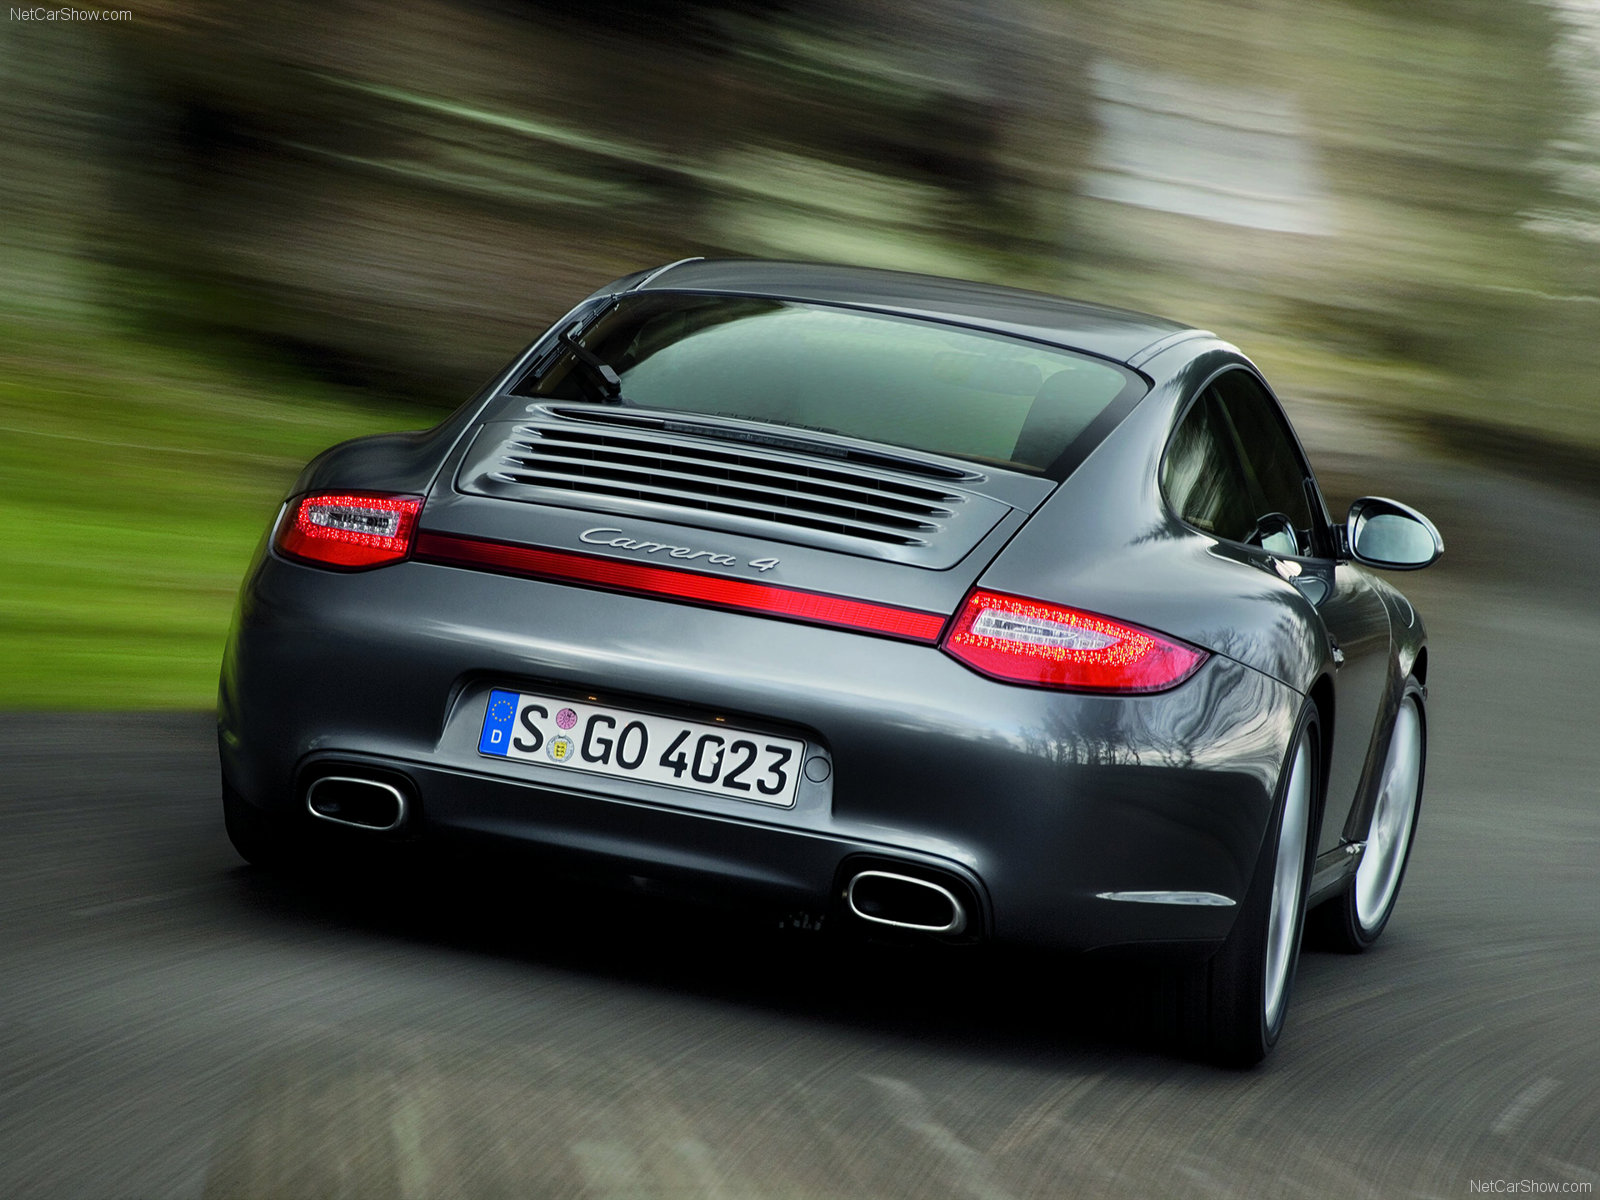 2009 Grey Porsche 911 Carrera 4 Wallpapers